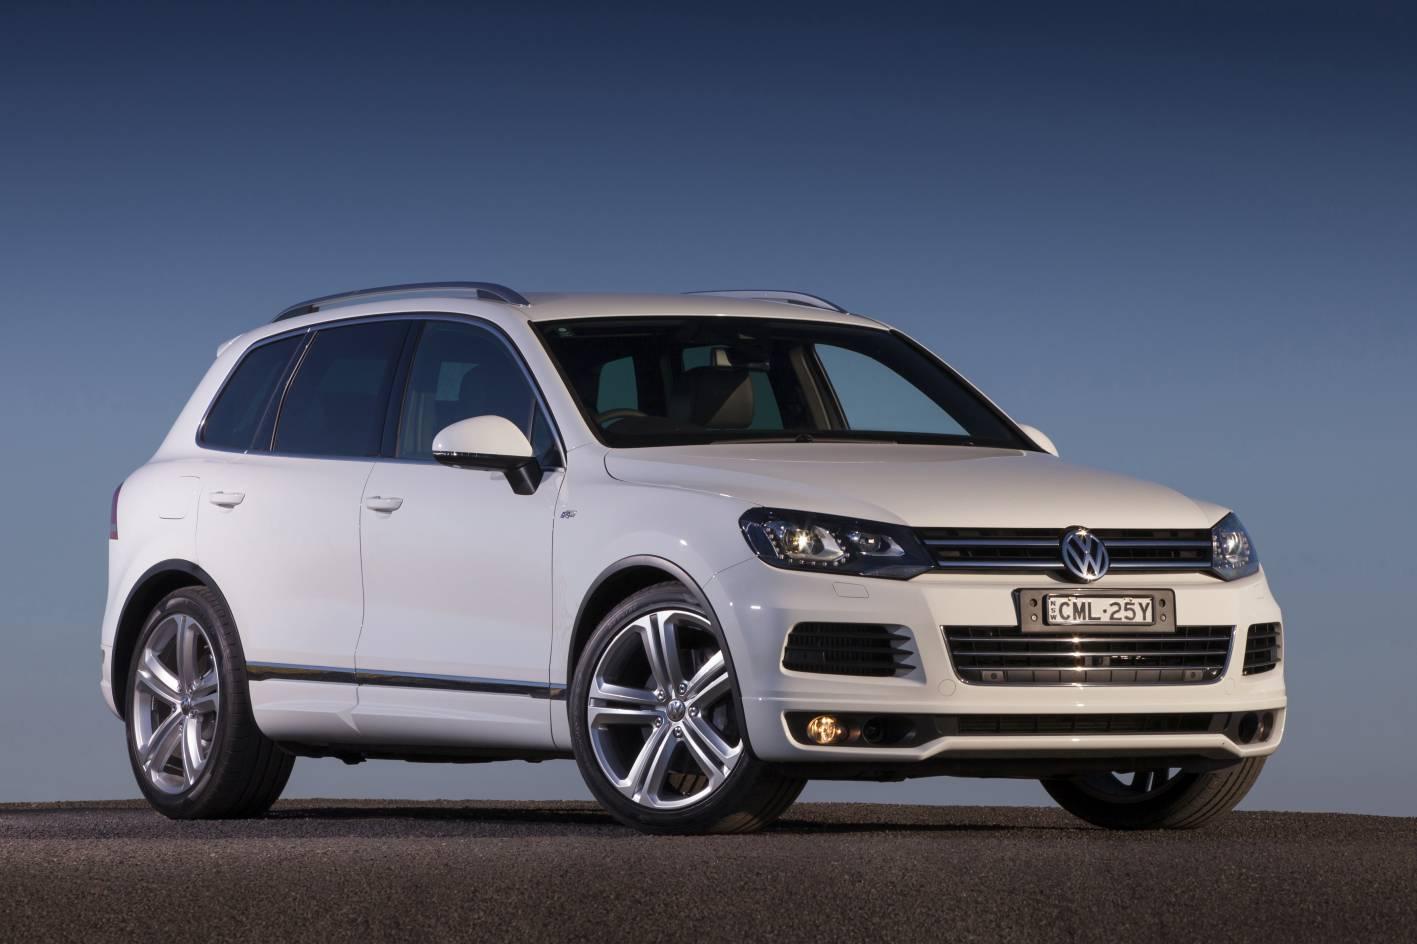 Volkswagen Cars - News: 2013 Touareg V8 TDI R-Line on sale